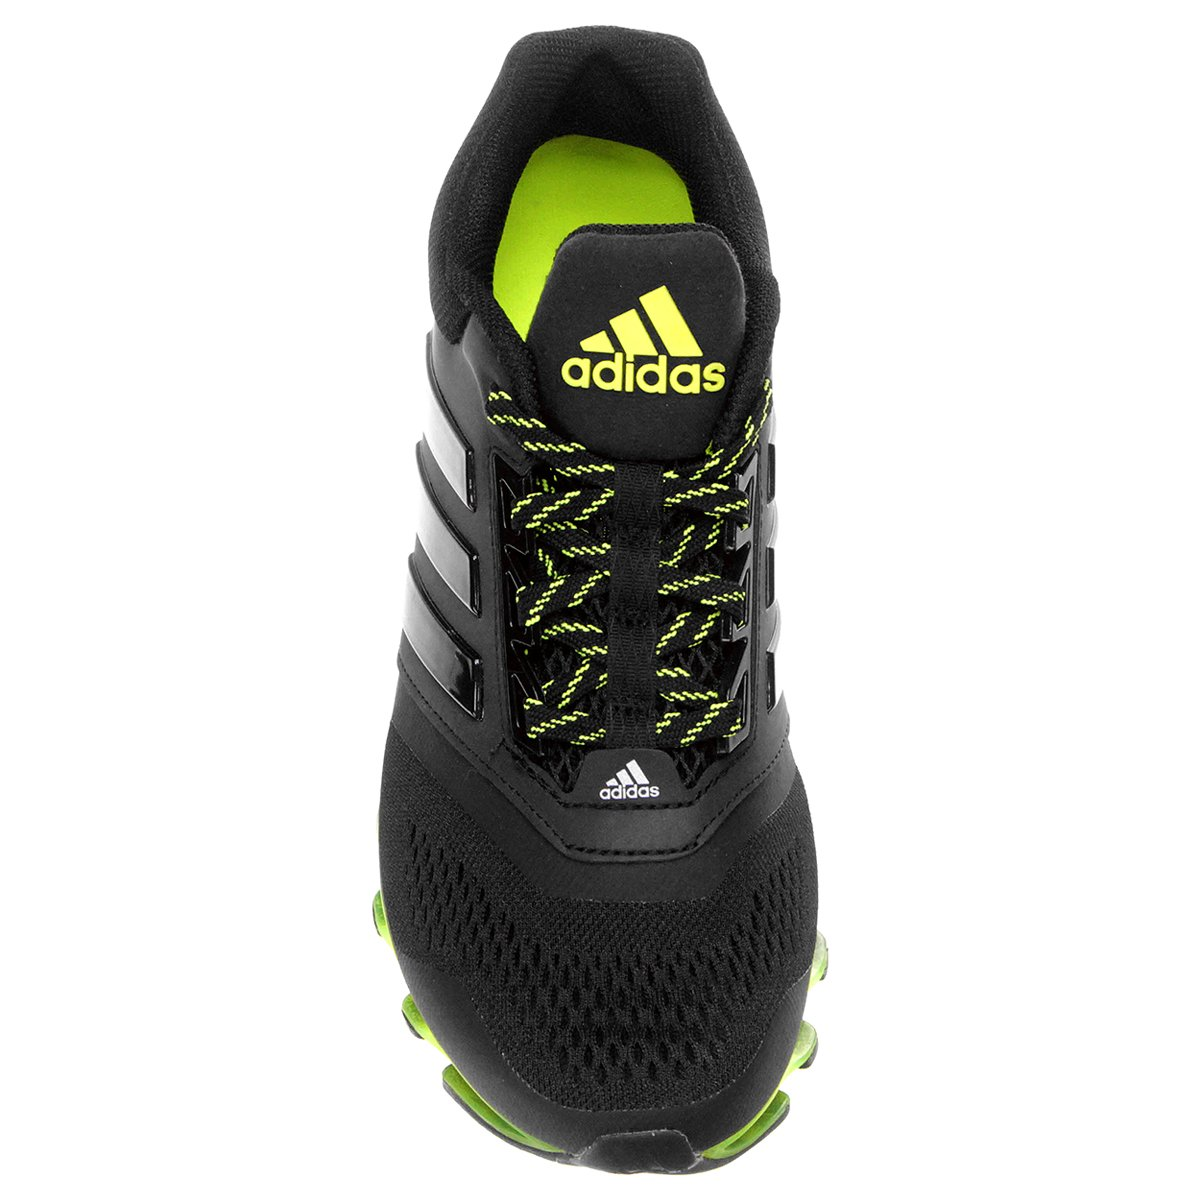 check out ae431 faff7 ... australia tênis adidas springblade drive 2 infantil 1d67c 5f7f2